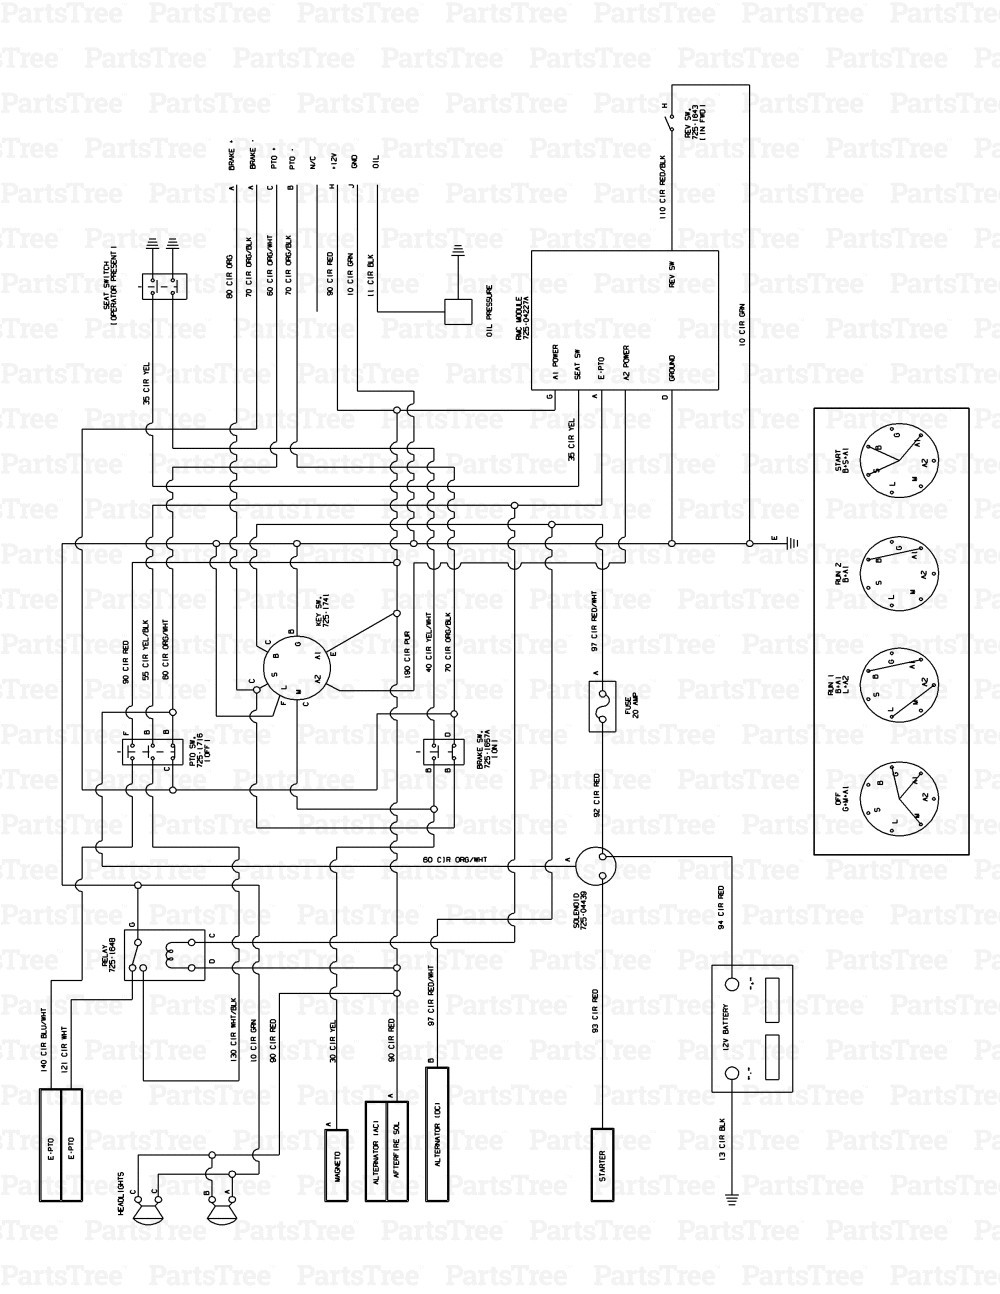 Cub Cadet Lt1050 Wiring Diagram Elegant Wiring Diagram Image